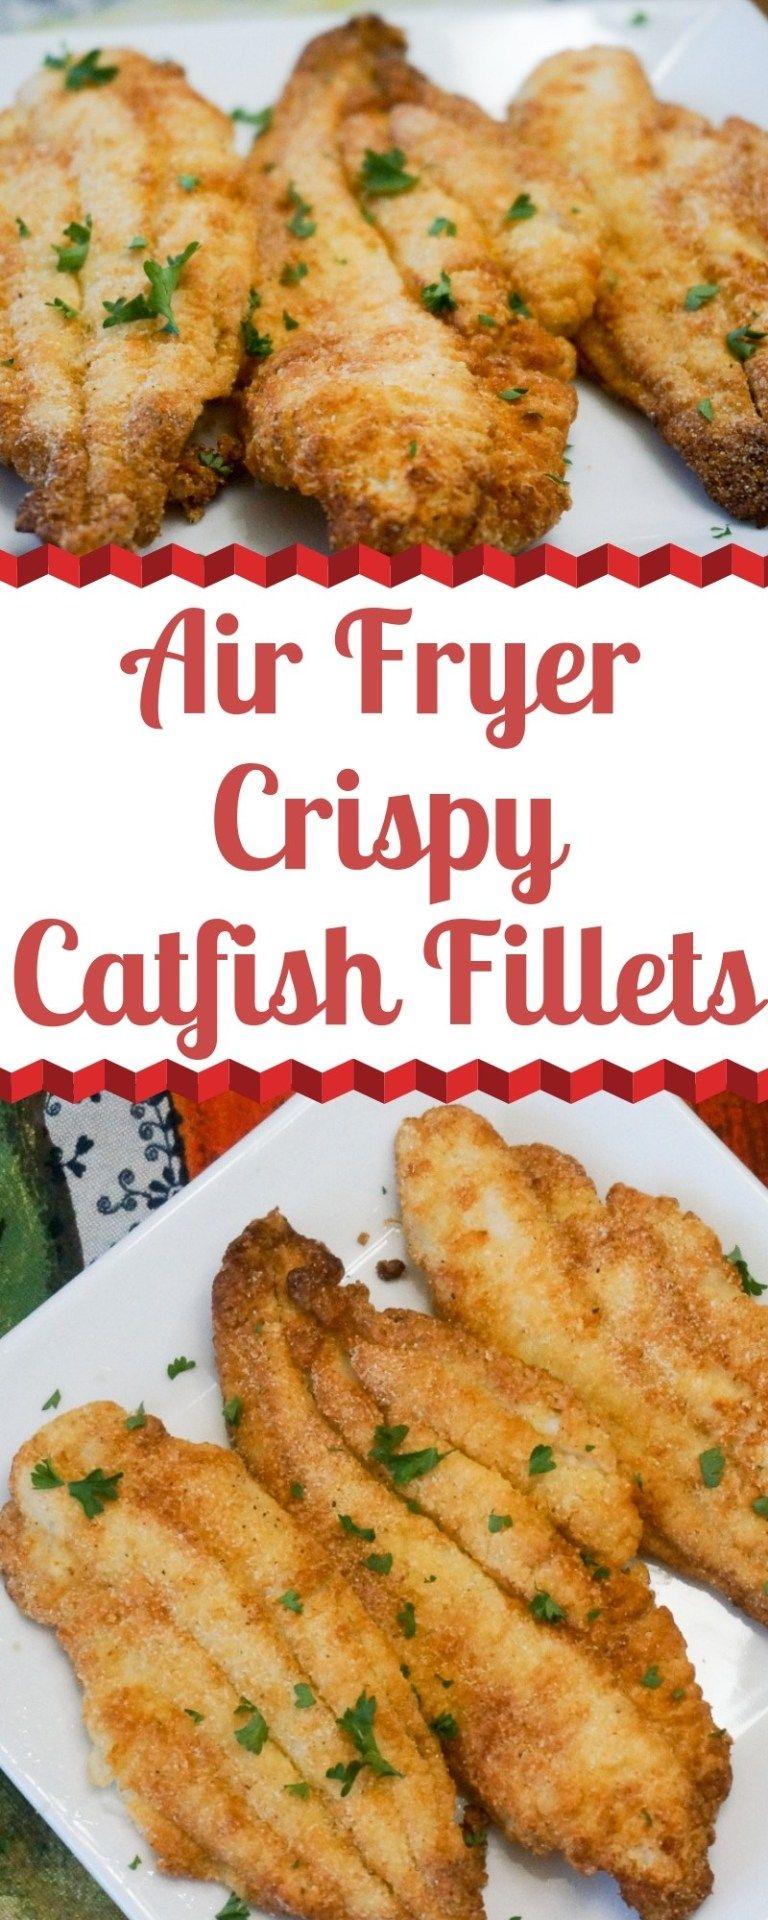 Crispy Air Fryer Catfish Recipe Catfish recipes, Air